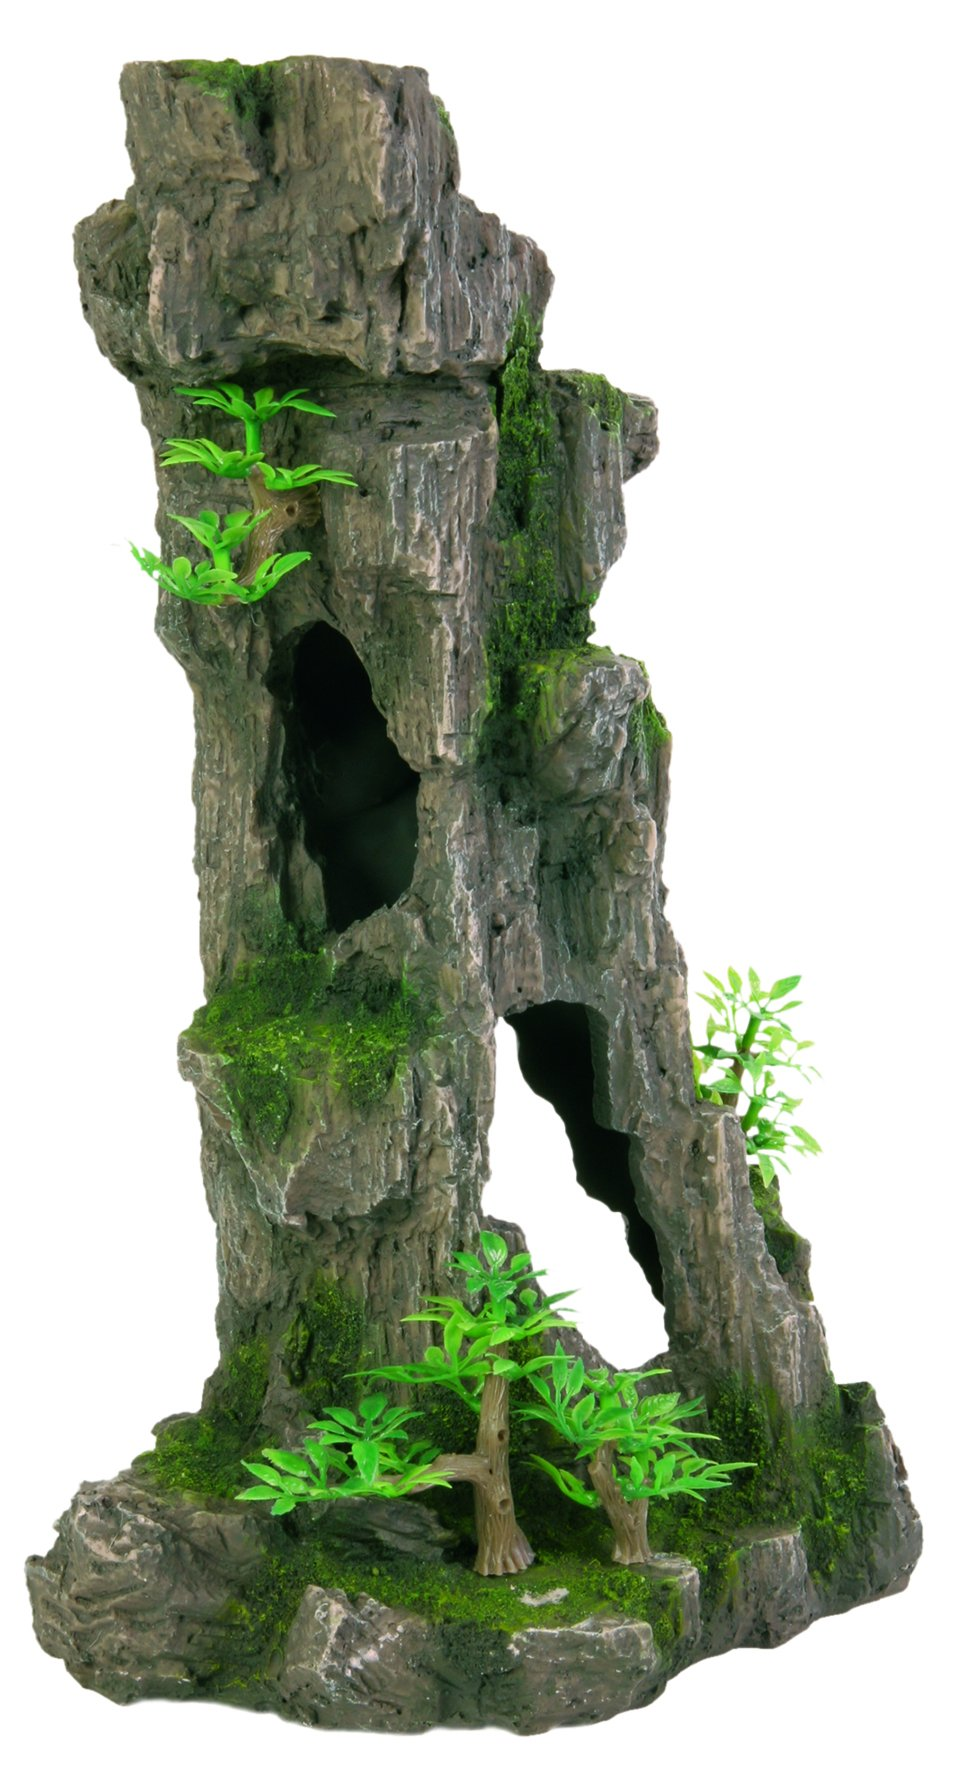 Trixie 8857 Aquarium Decoration Rock Formation with Caves / Plants Upright 28 cm